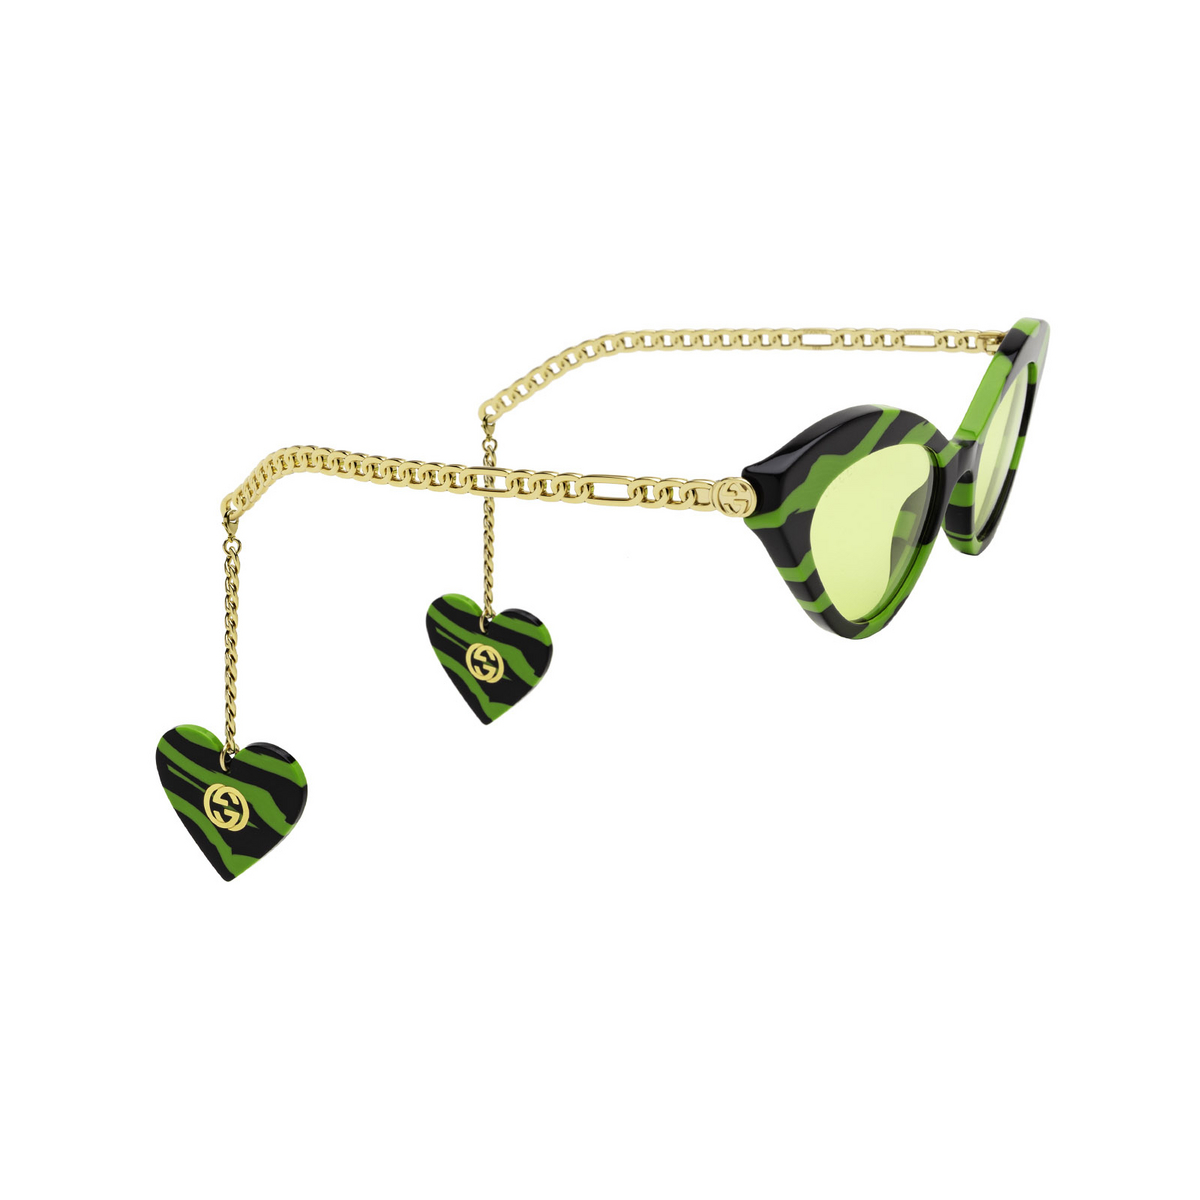 Gucci® Cat-eye Sunglasses: GG0978S color Green & Black 006 - three-quarters view.